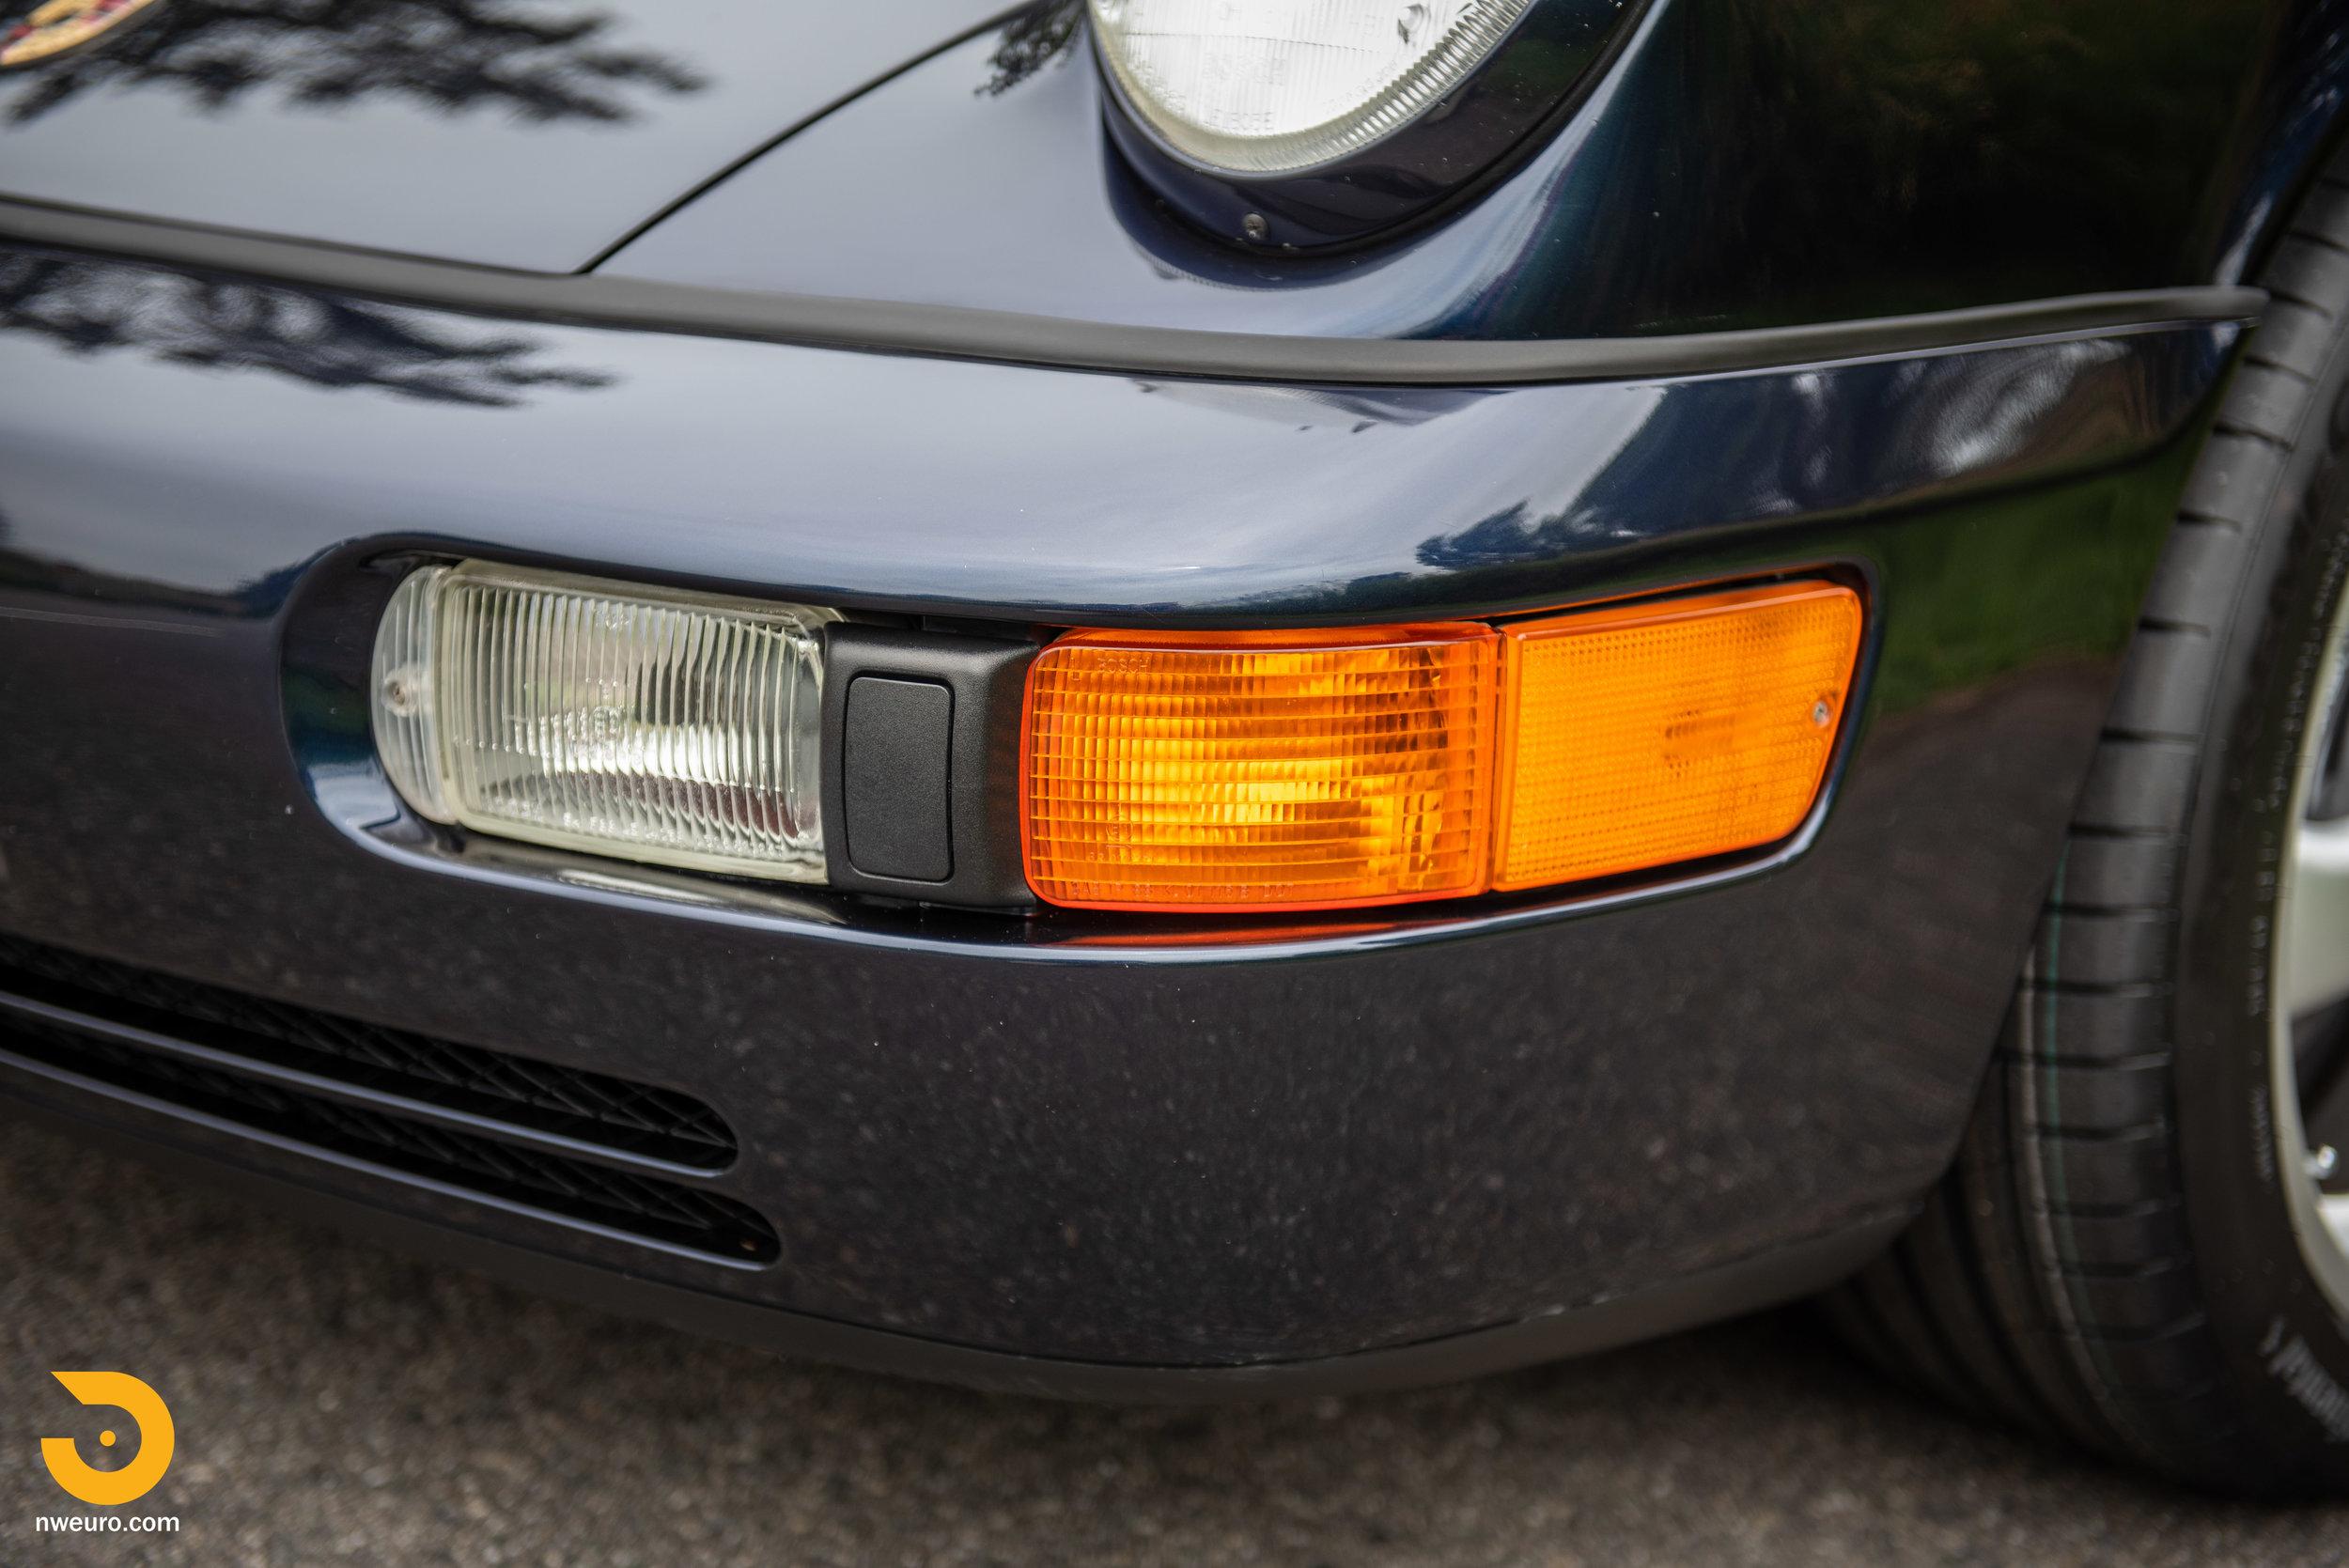 1993 Porsche RS America Midnight Blue-16.jpg